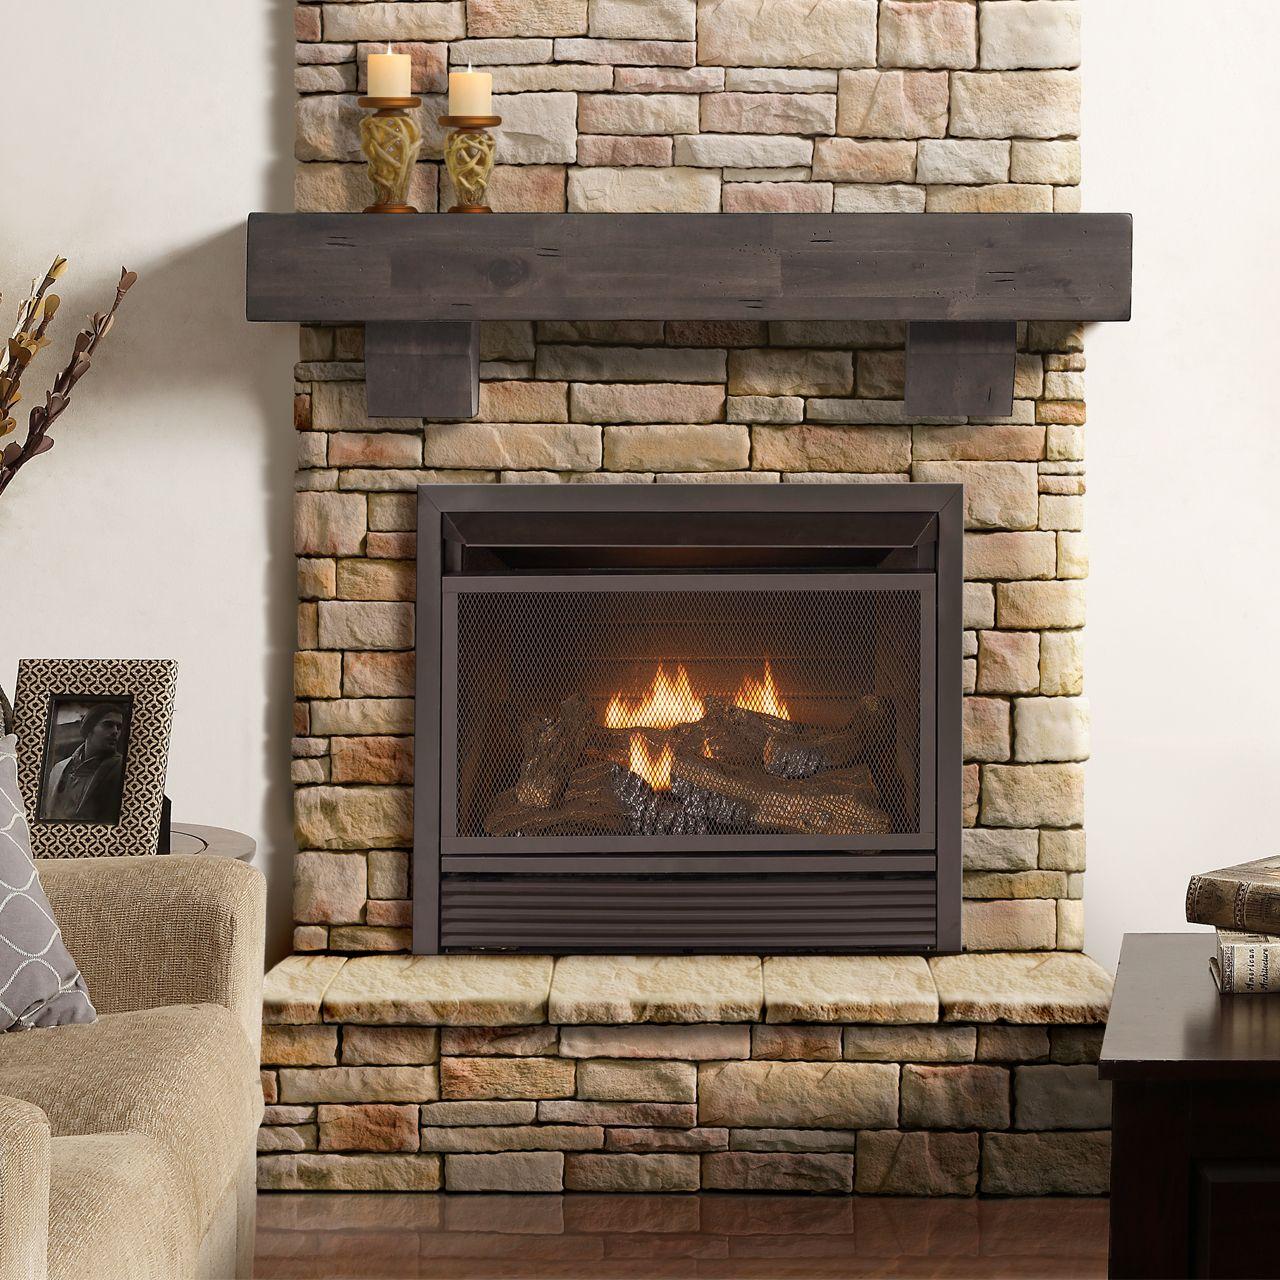 Procom Fireplaces 29 In Ventless Dual Fuel Firebox Insert Fbnsd28t Fireplace Shelves Gas Fireplace Ventless Fireplace